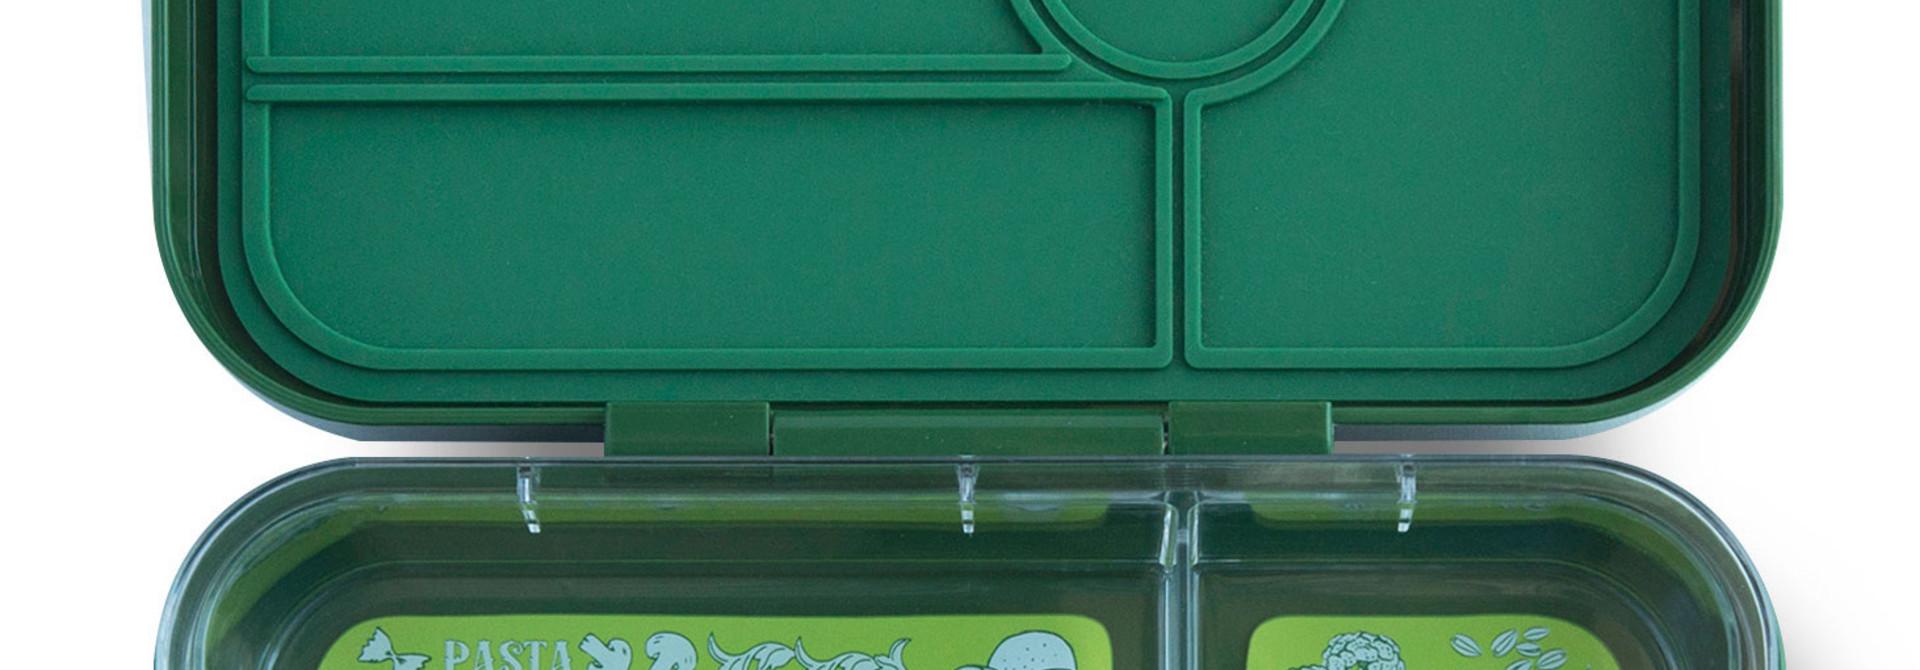 Yumbox Tapas XL lunchbox Brooklyn green / Bon appetit tray 5 vakken